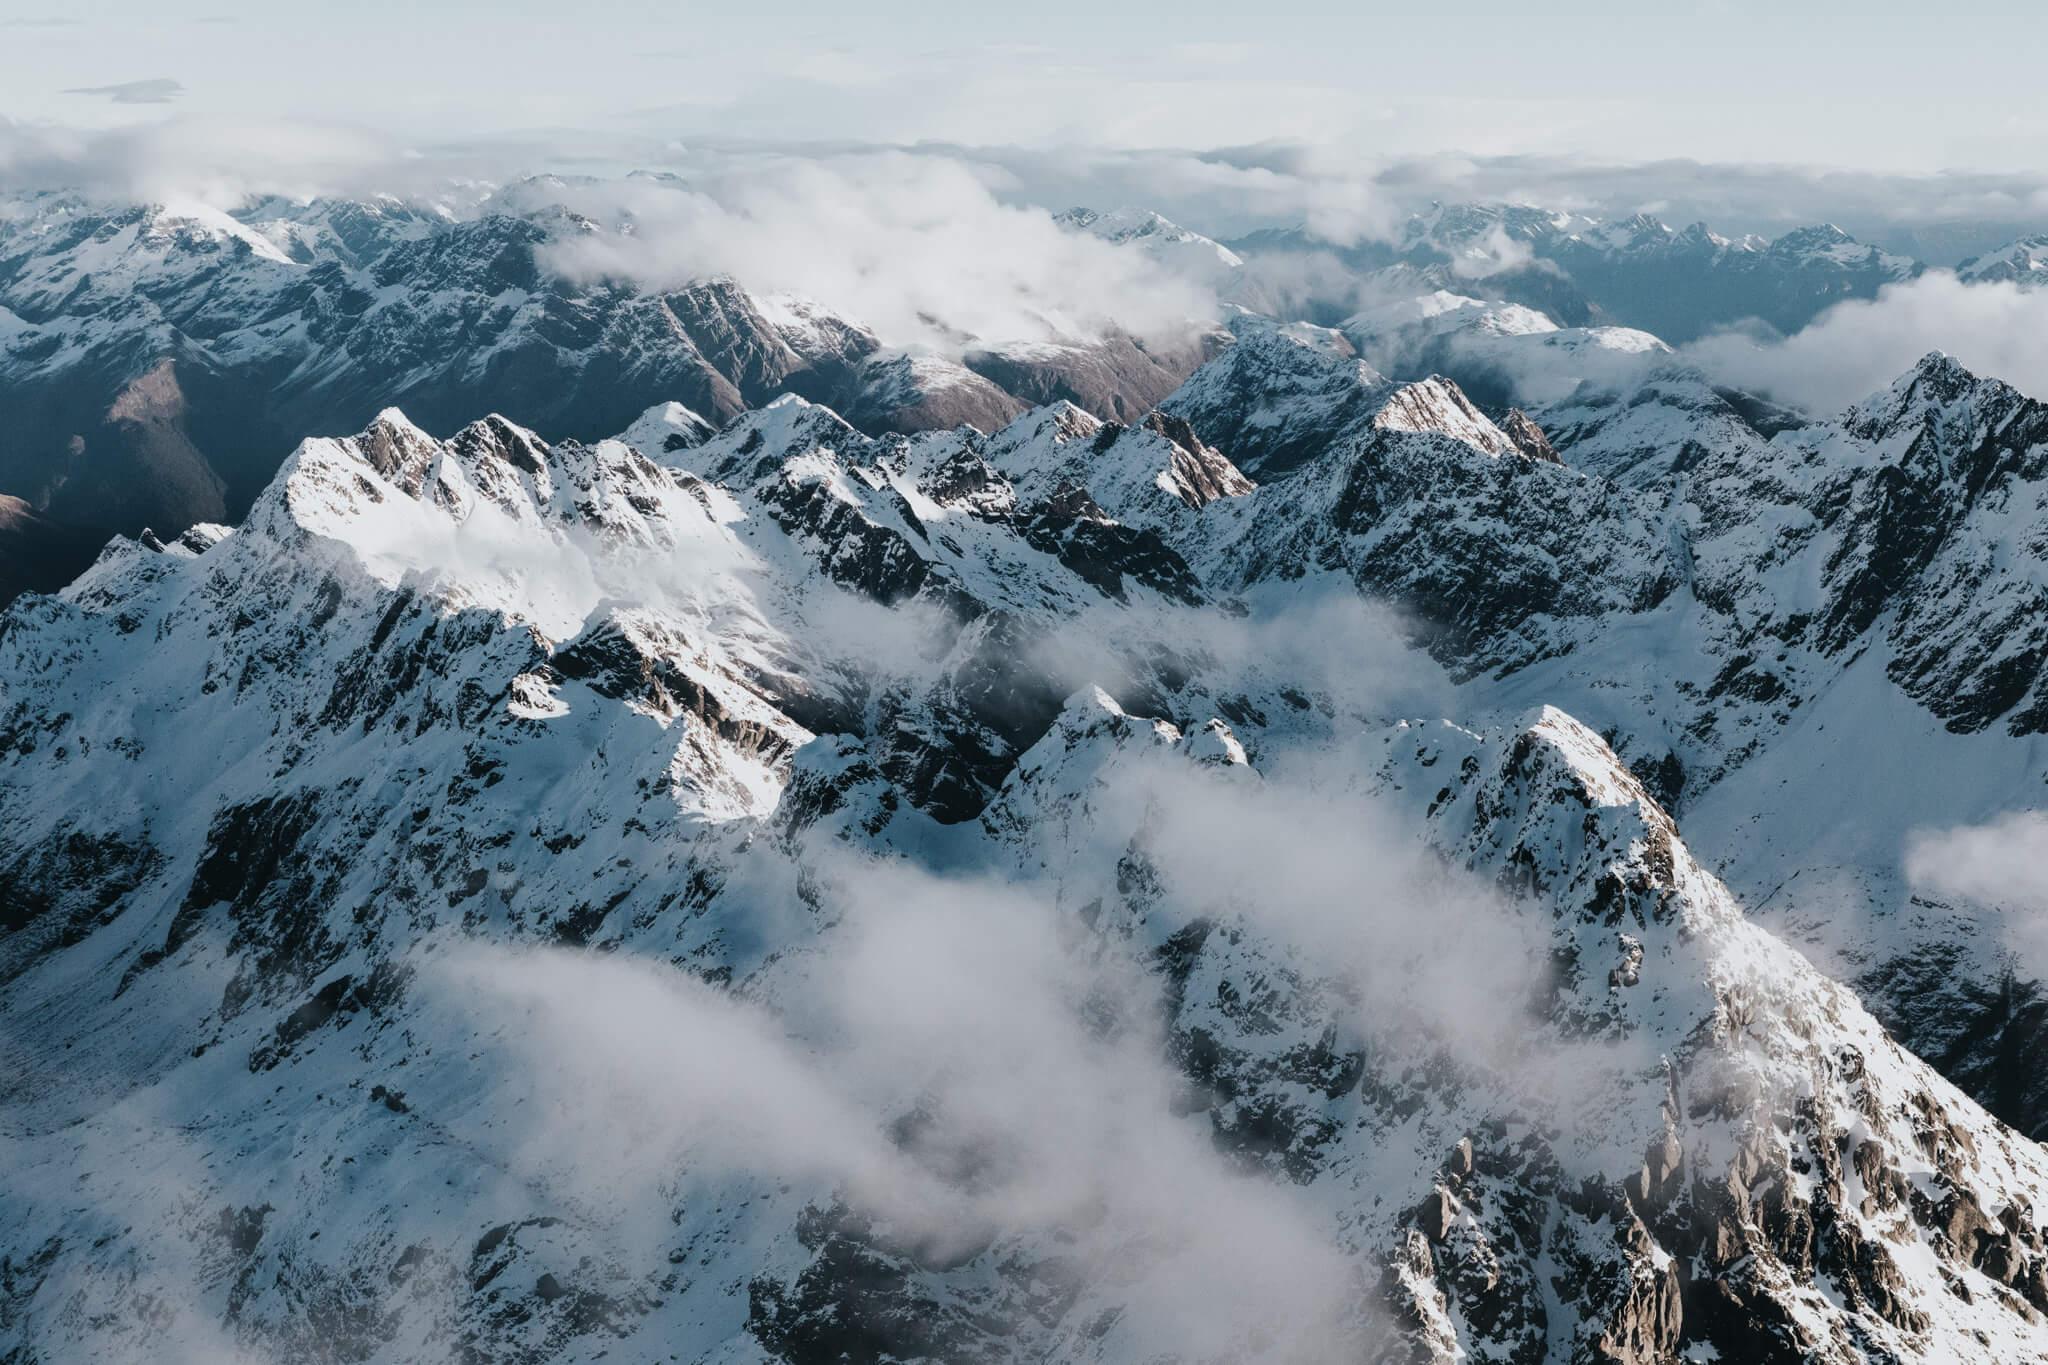 New-Zealand-Travel-Photography-Natalie-Skoric-14.jpg